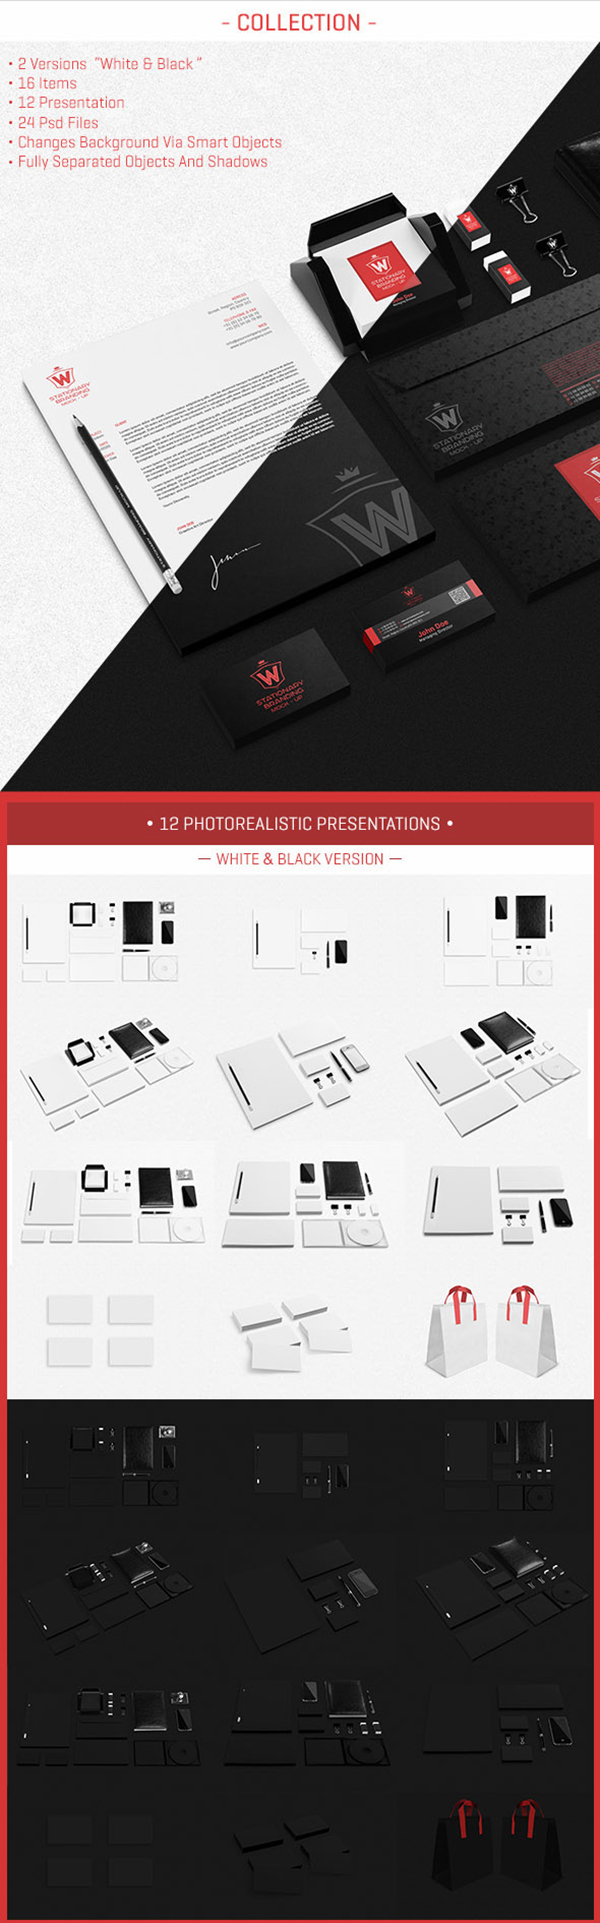 07 Stationery Branding Mock-Up Black